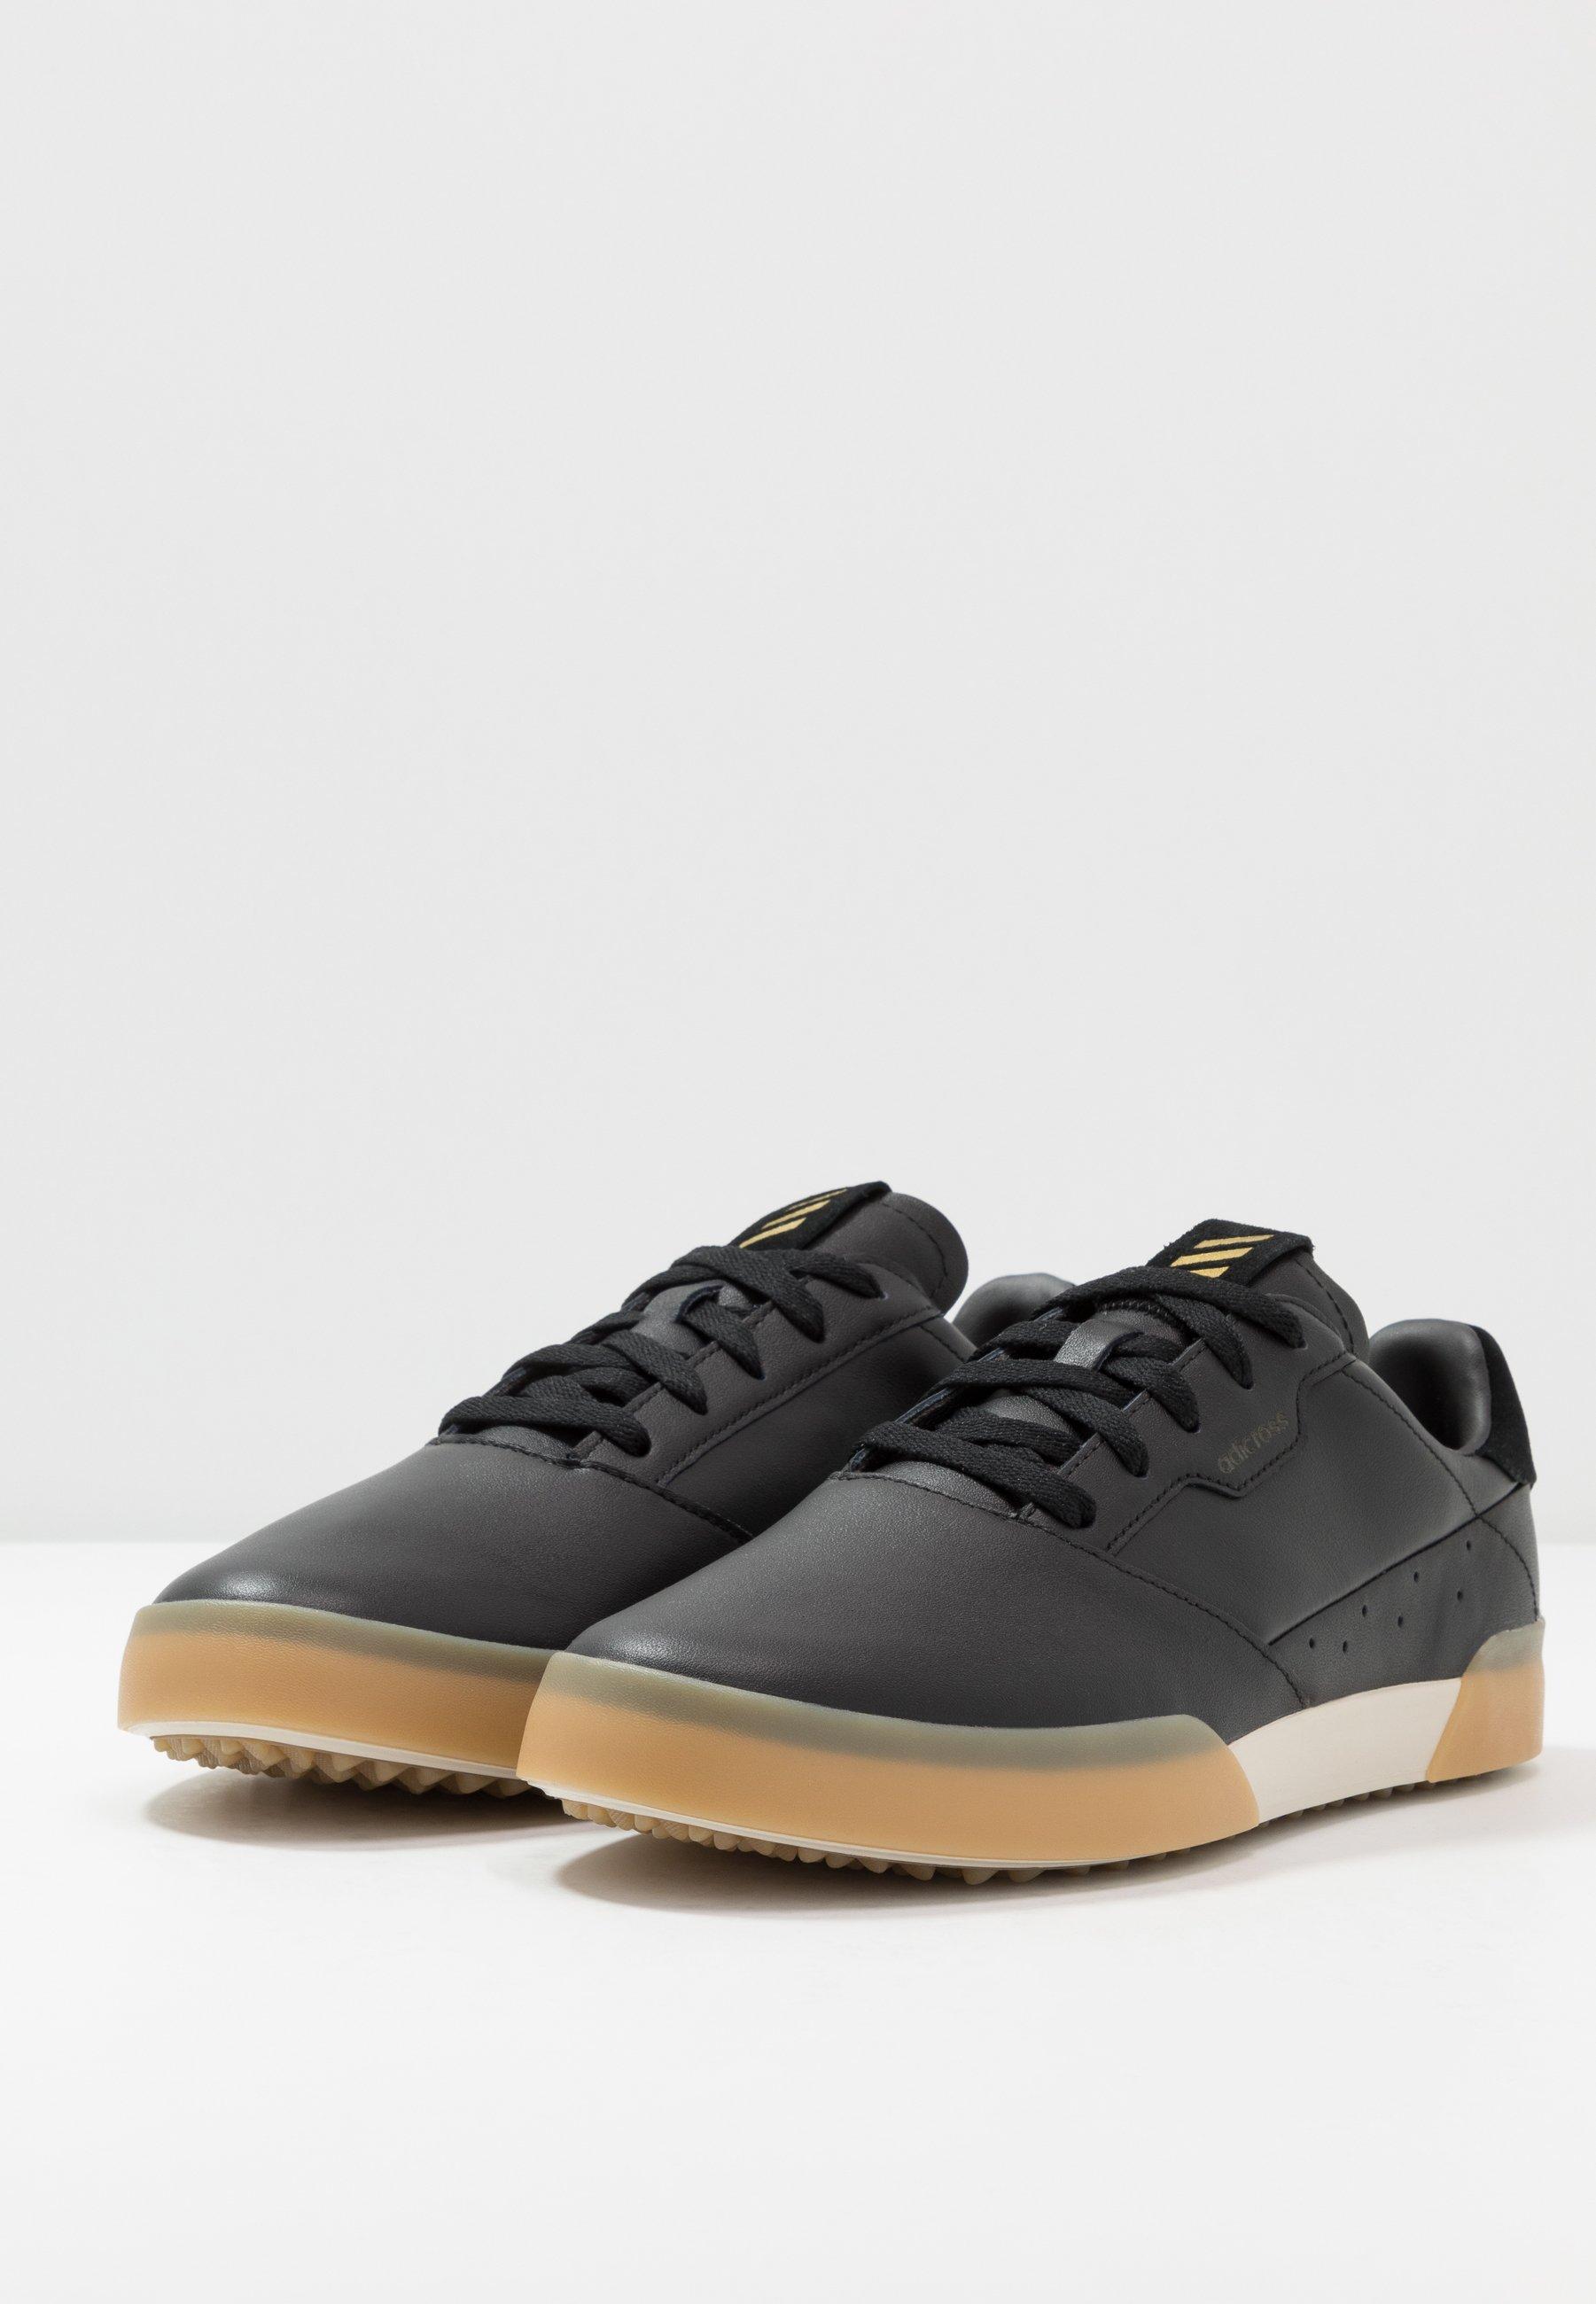 Adidas Golf Adicross Retro - Golfskor Core Black/gold Metallic/clear Brown